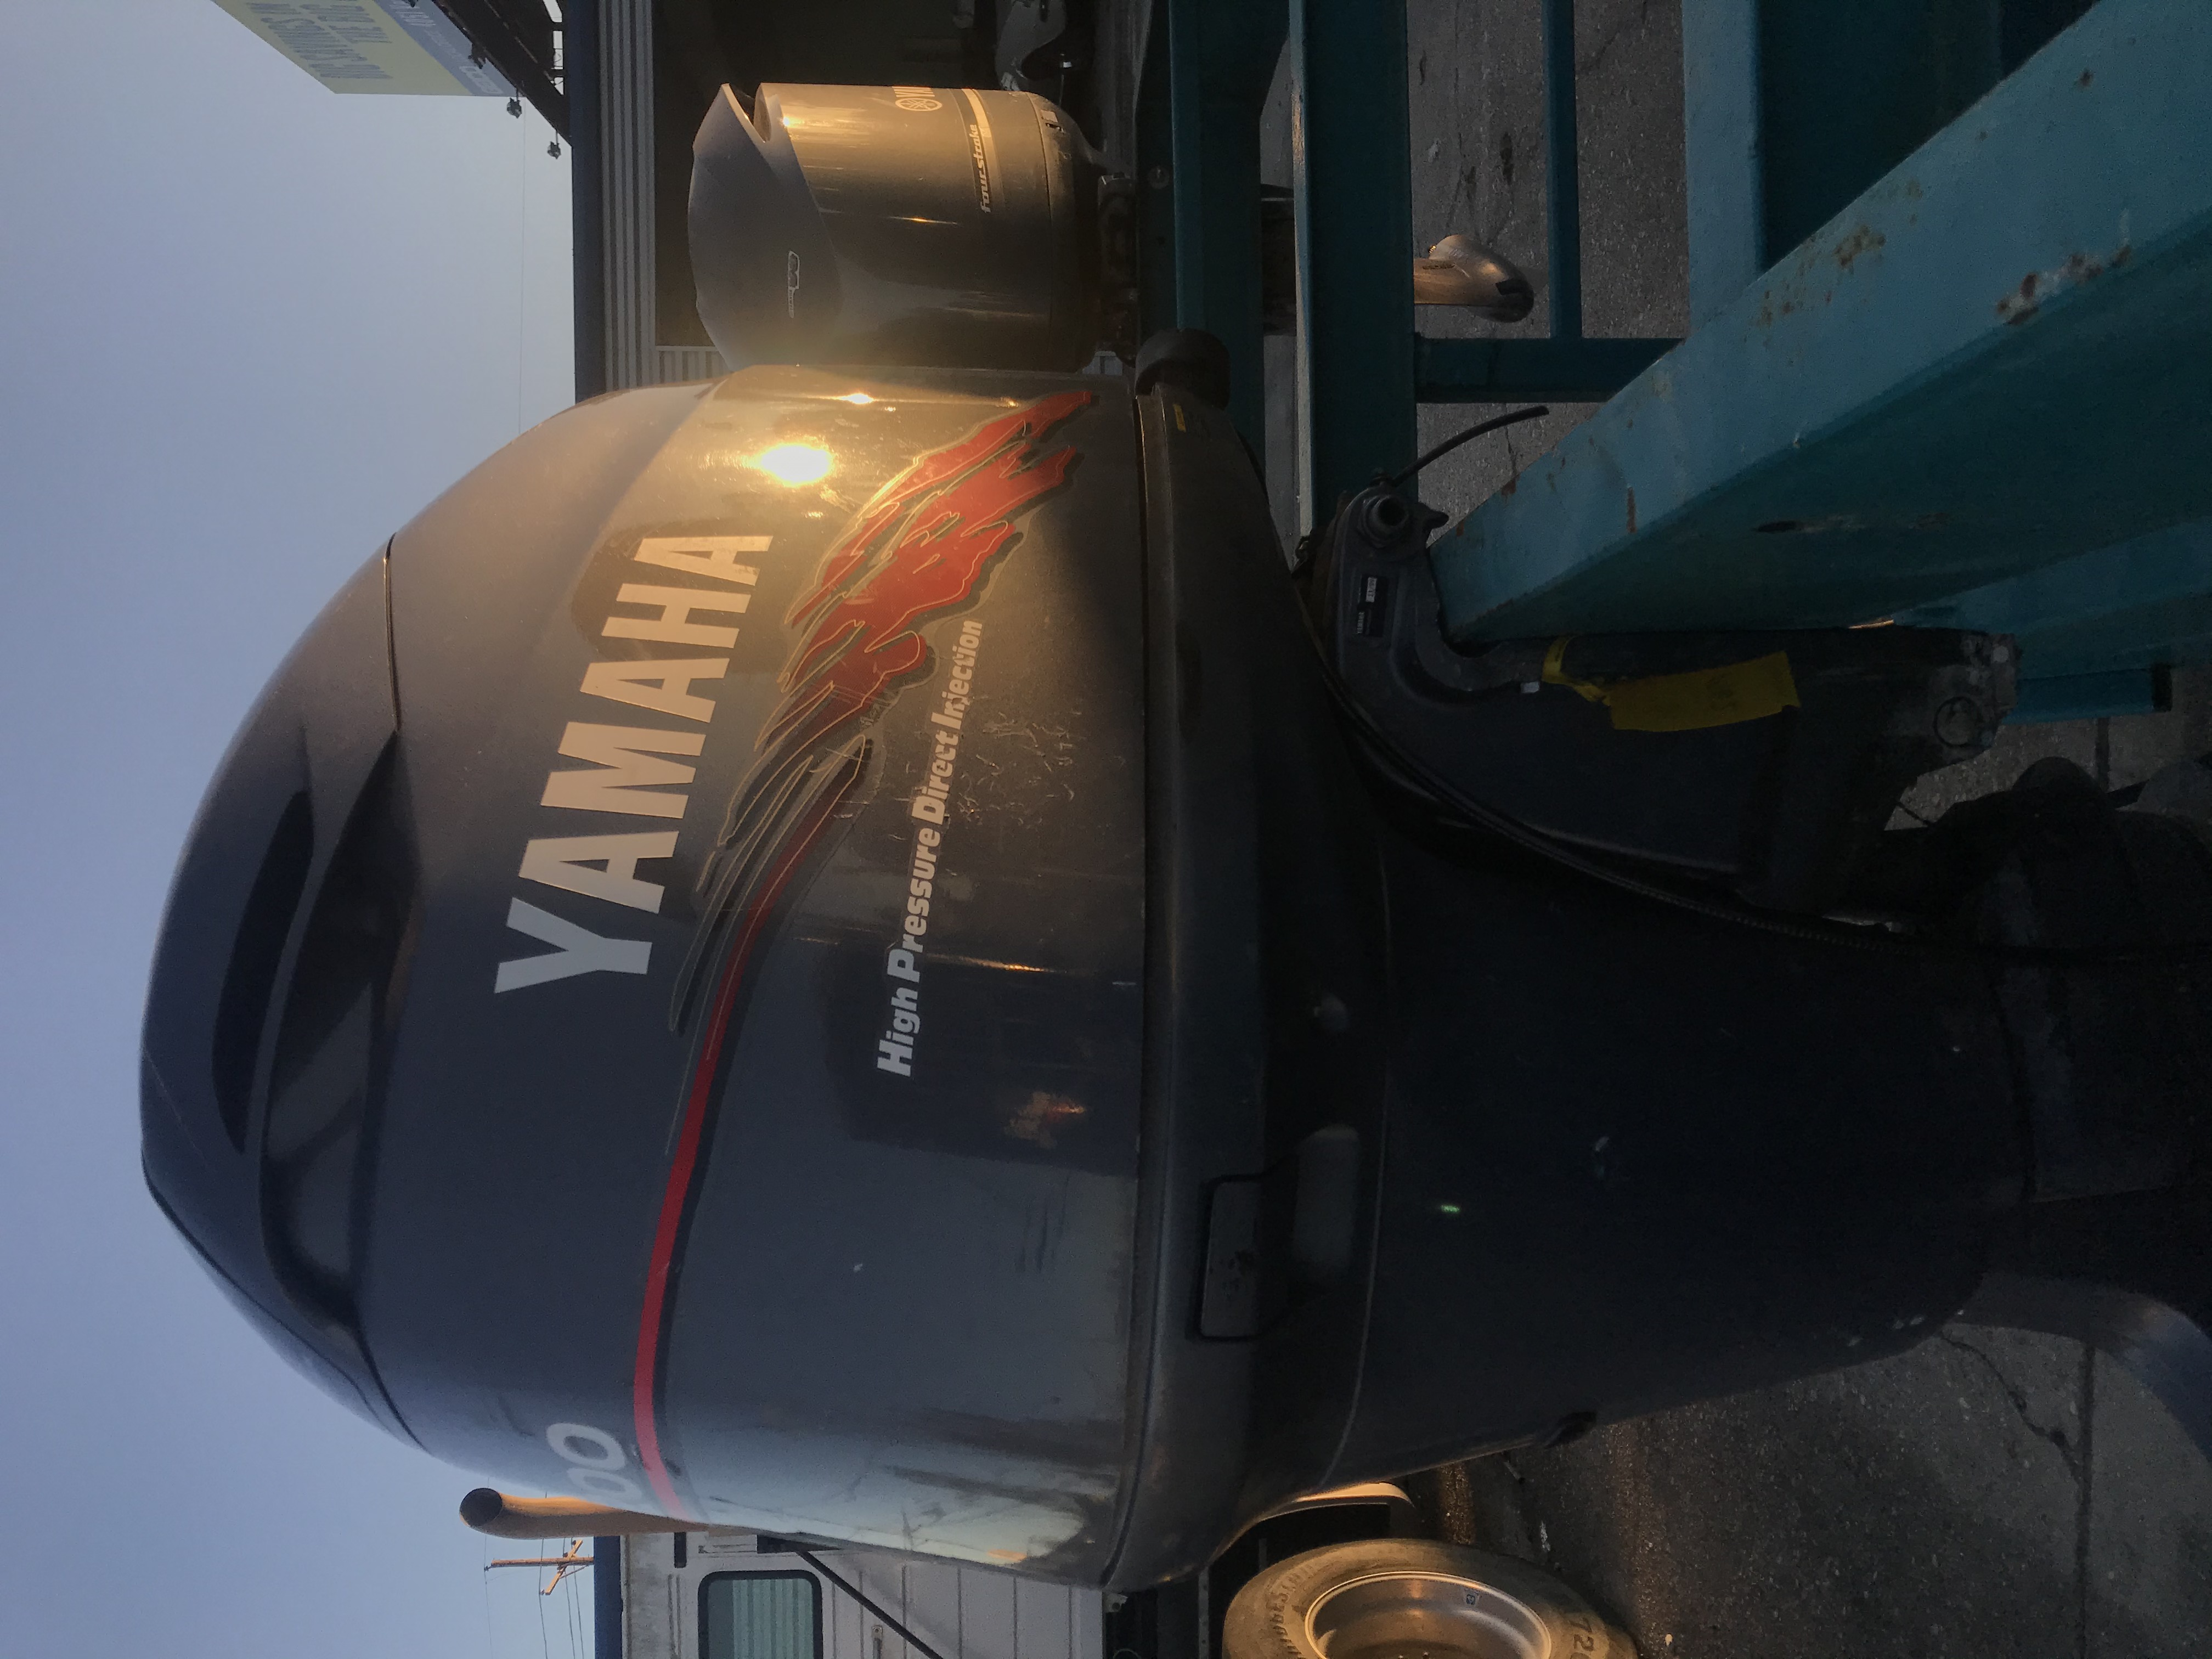 New  1999 Yamaha Outboard Motors Outboard in Marrero, Louisiana